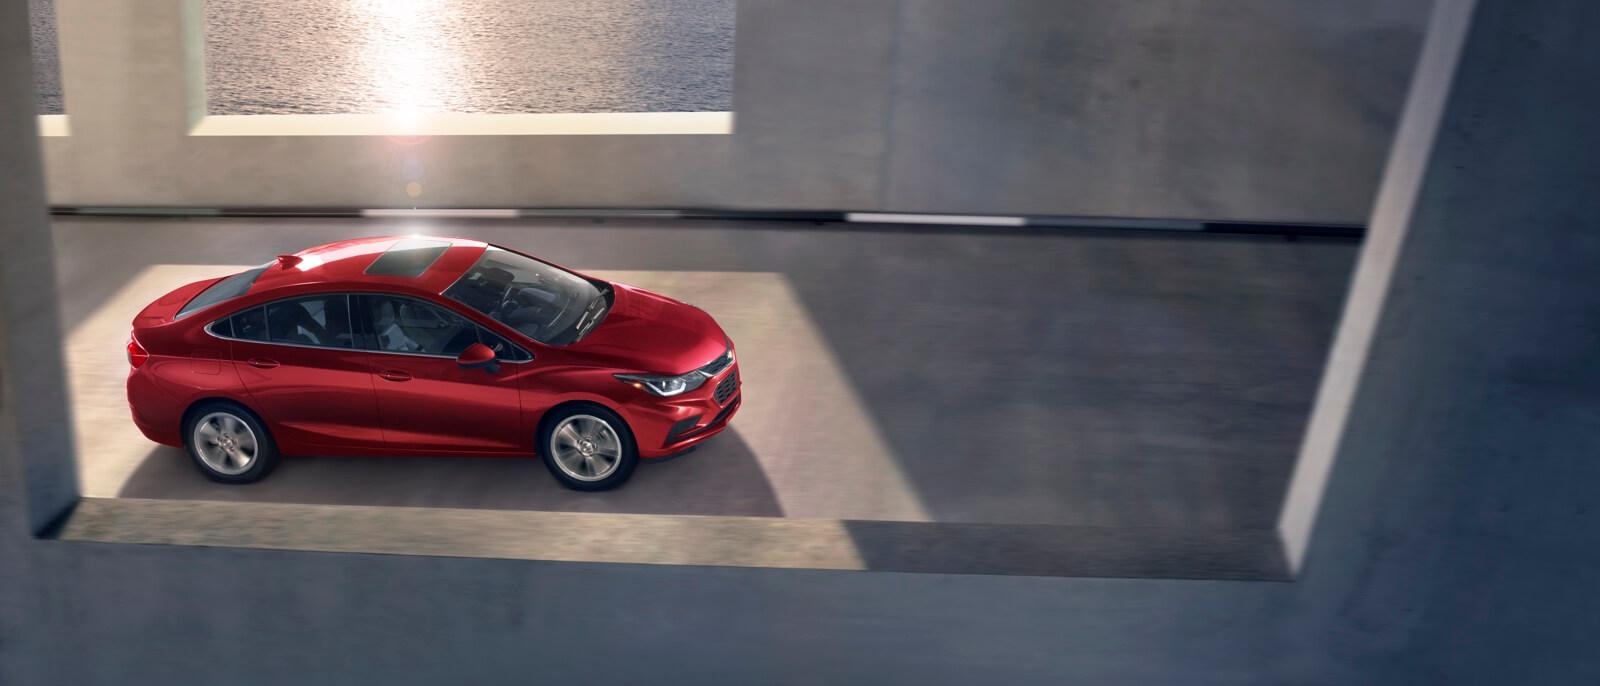 2017 Chevrolet Cruze Sedan red exterior